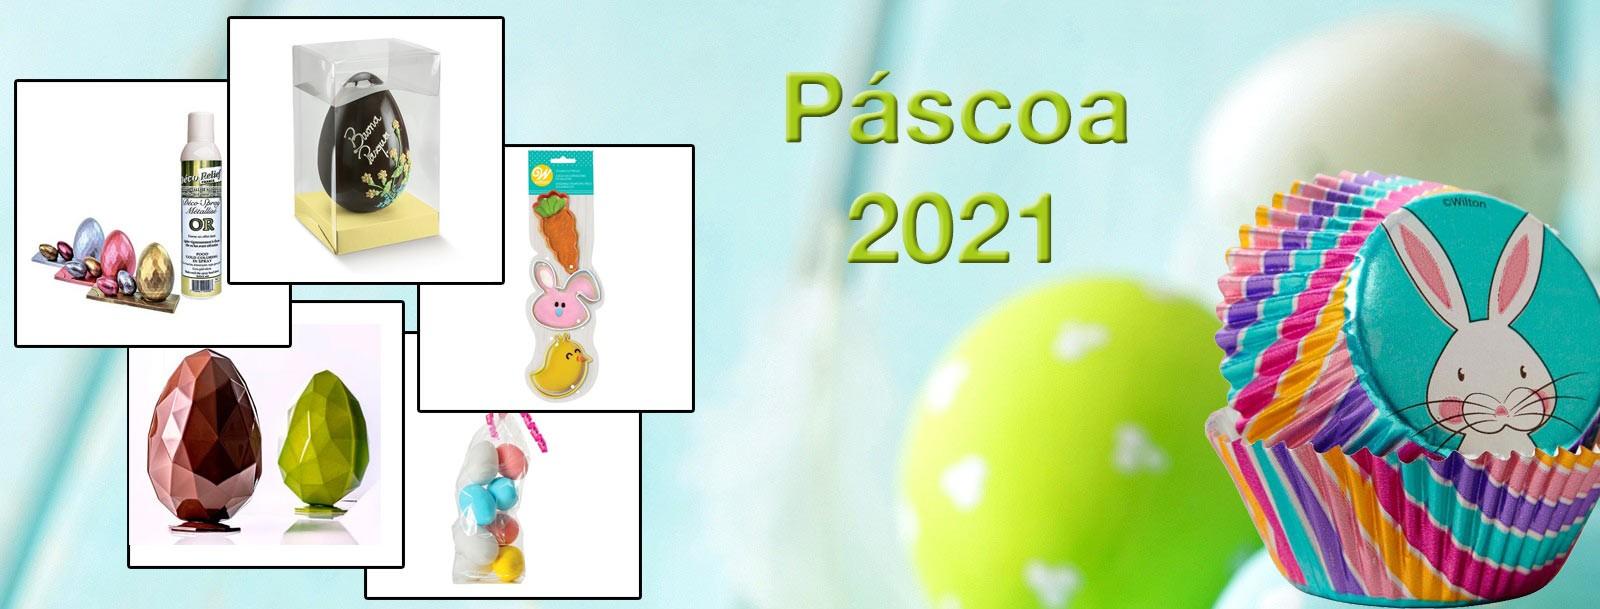 Pascoa 2021